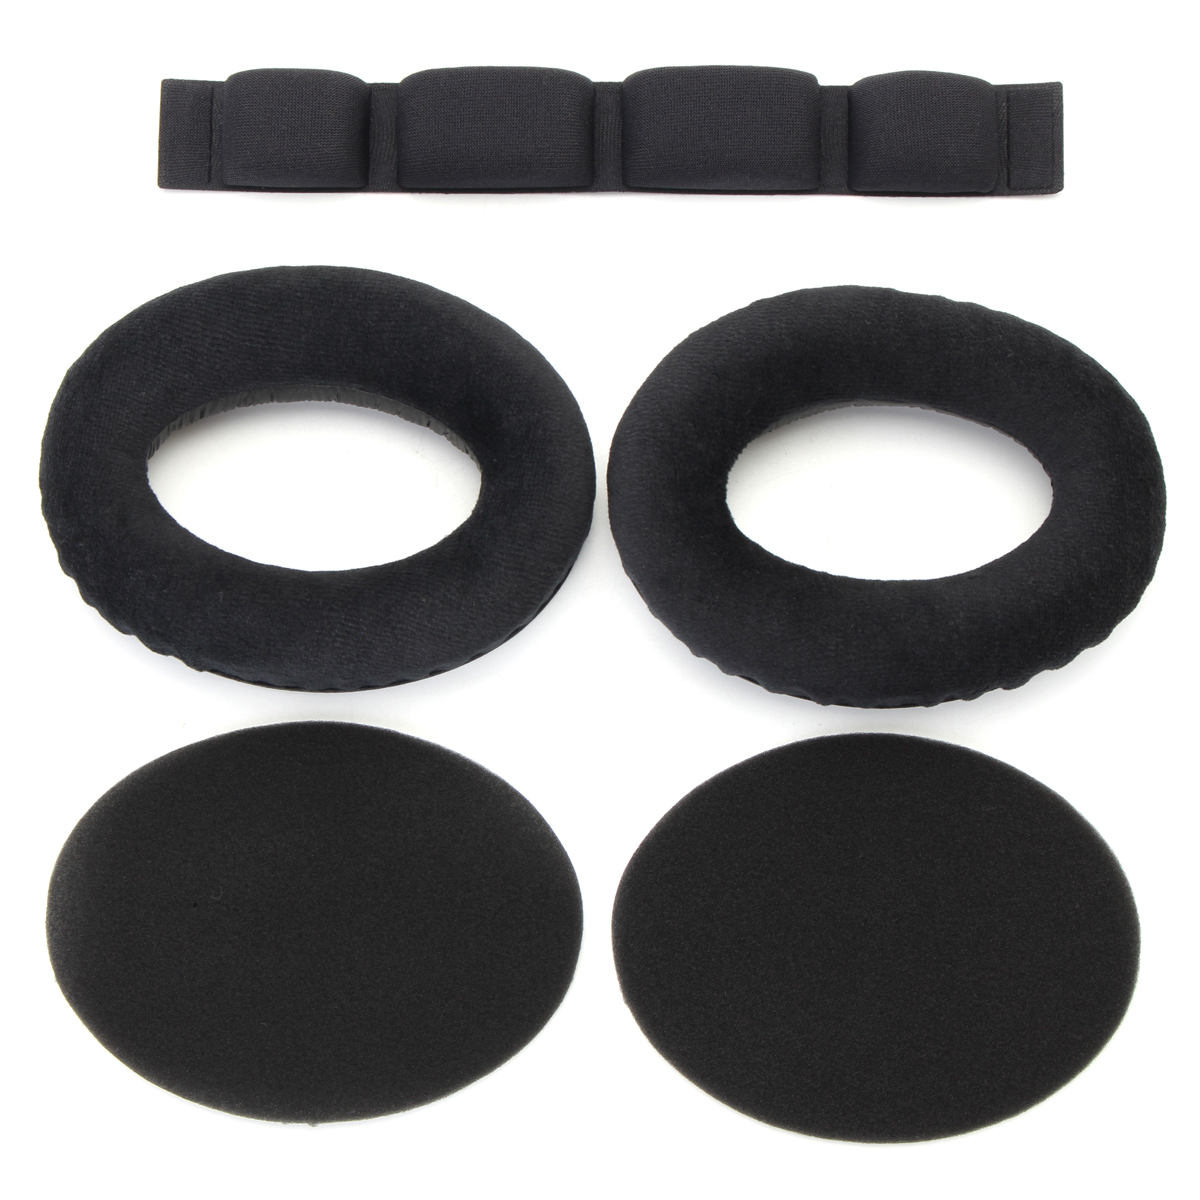 1 Pair Replacement Velour Ear Pad Headband for Headphone HD545 HD565 HD580 HD600 HD650